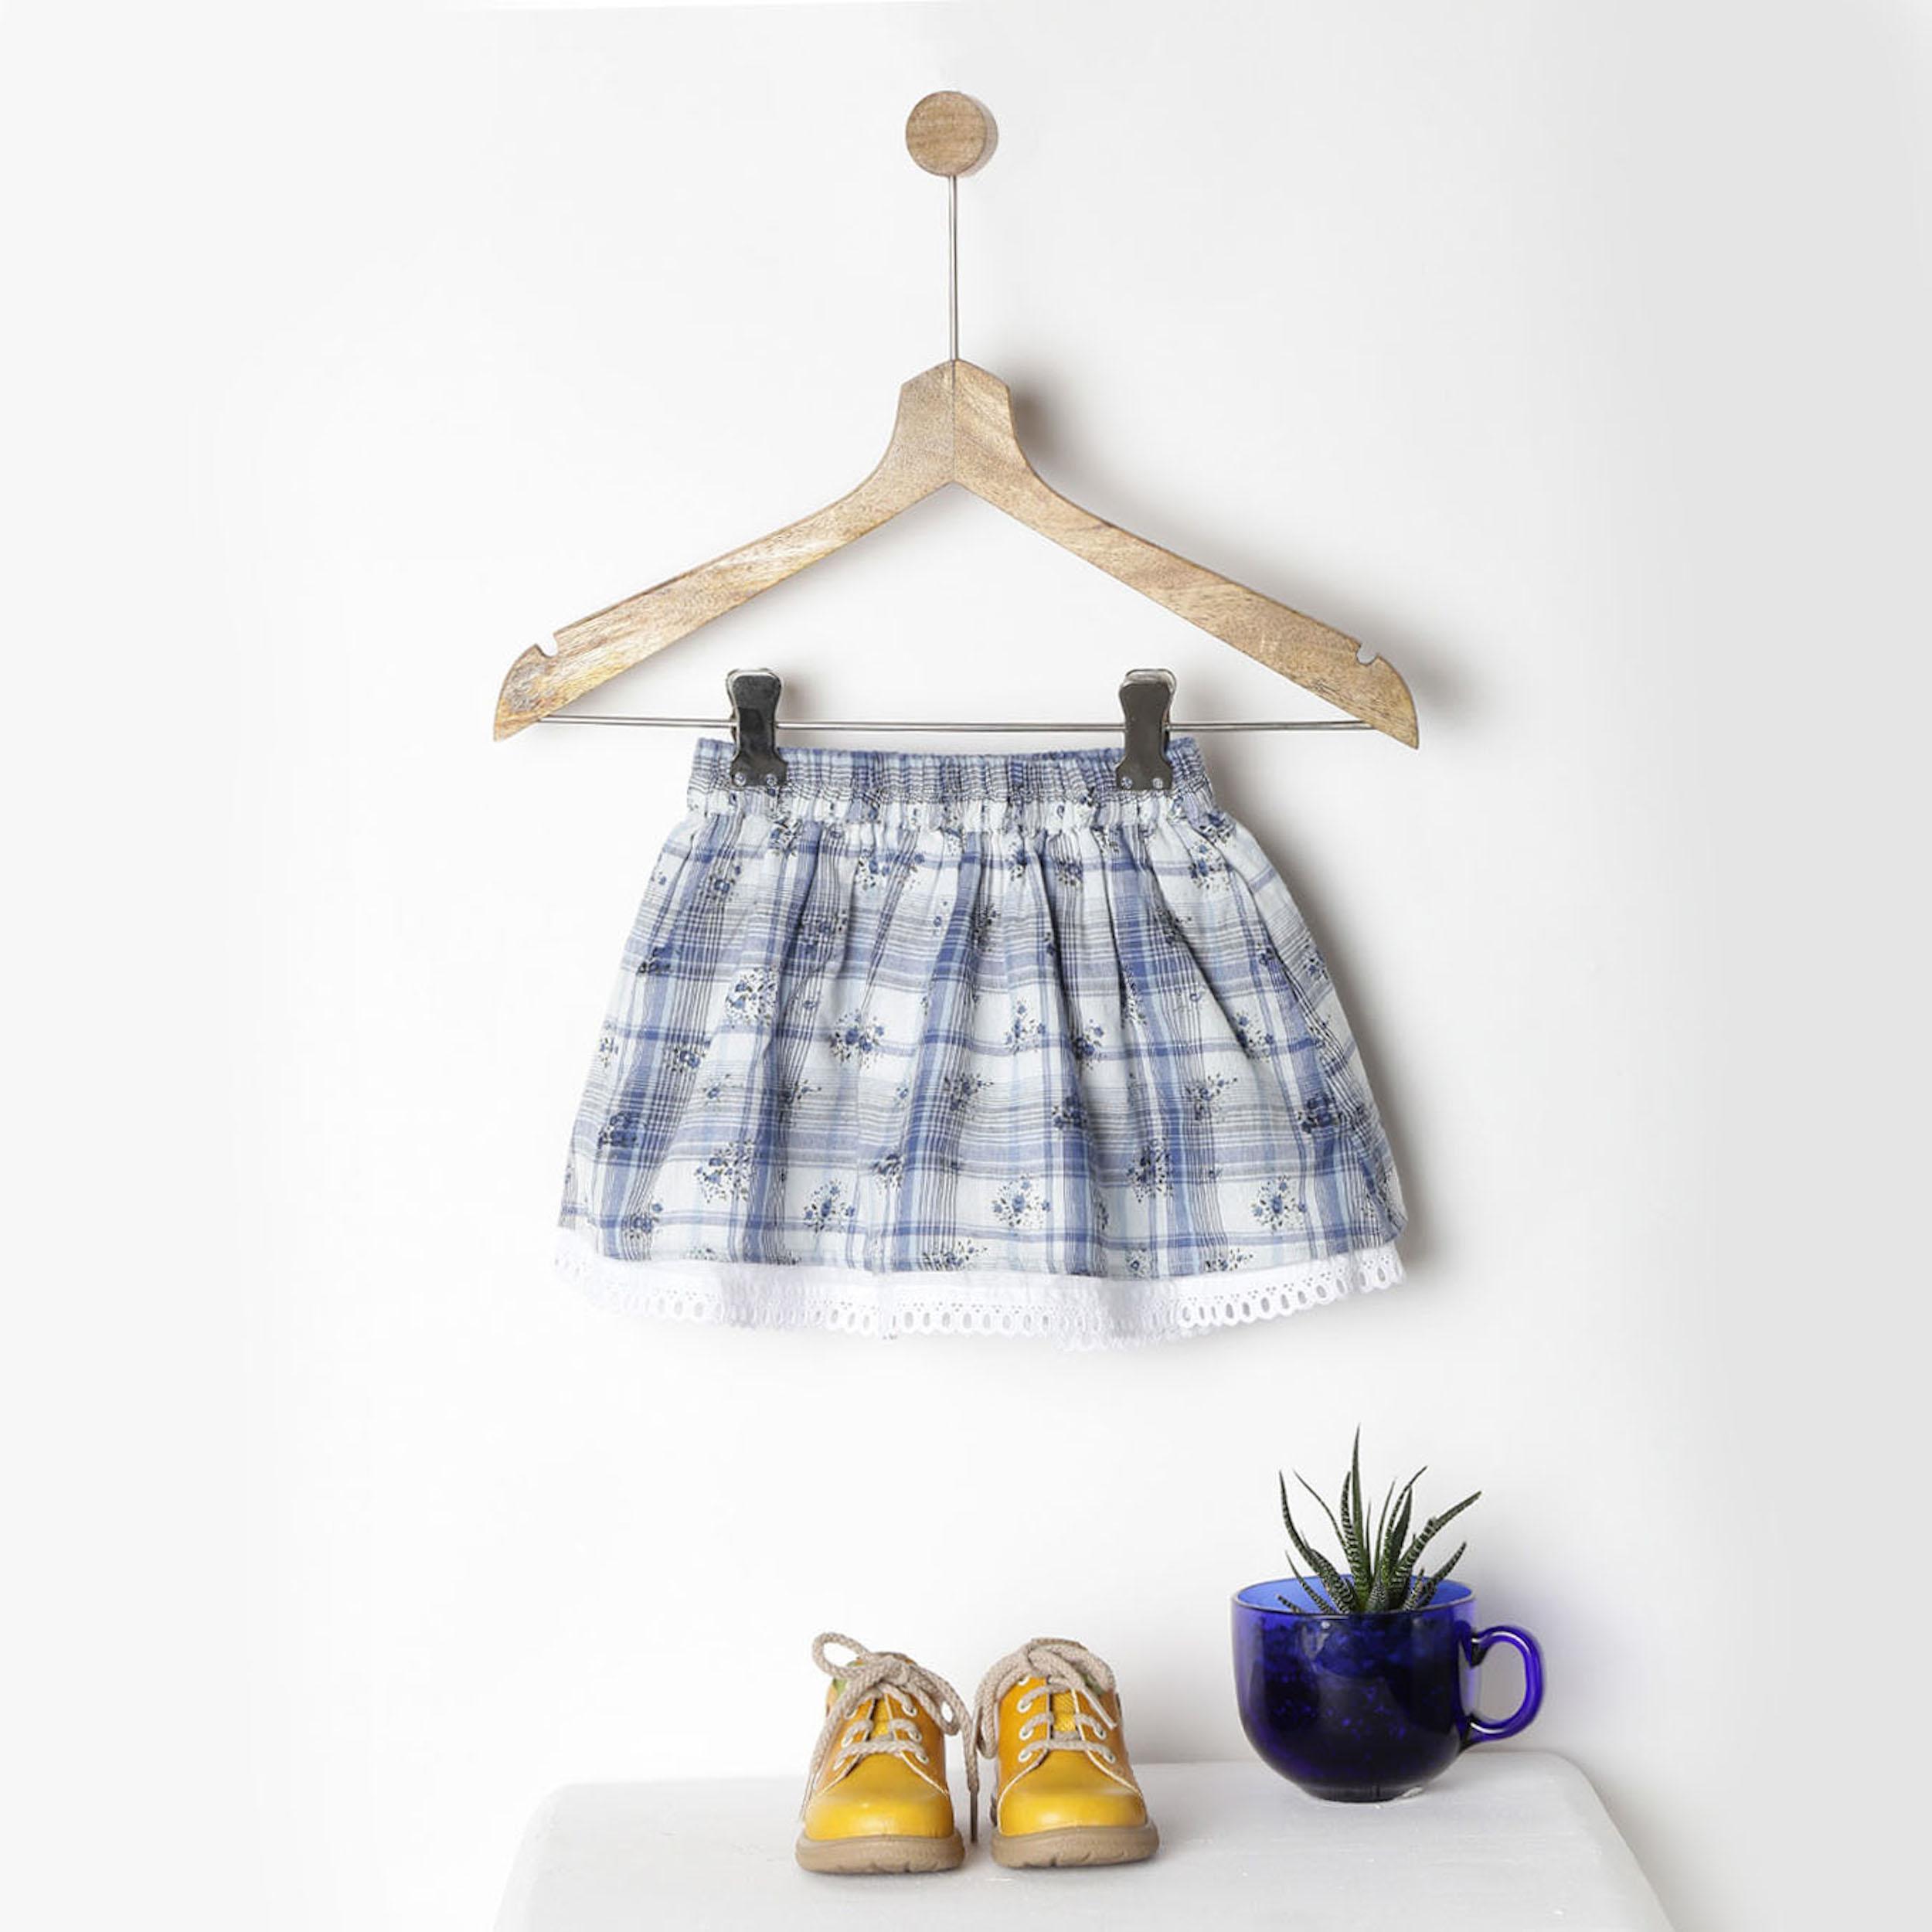 Blue & white lace hem skirt with pockets